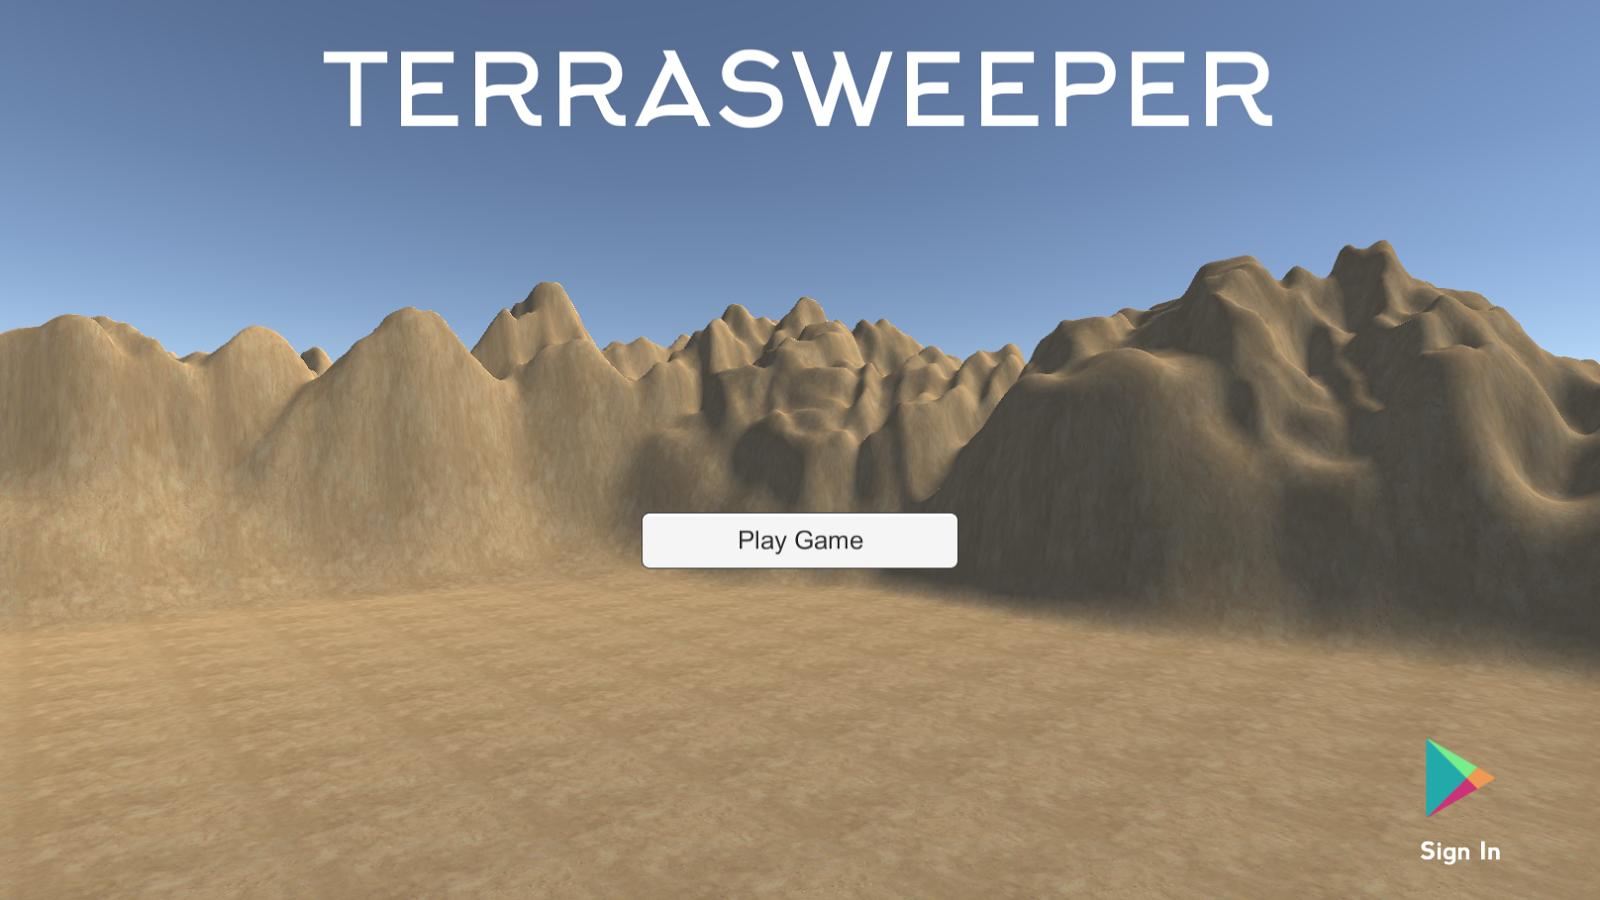 Terrasweeper